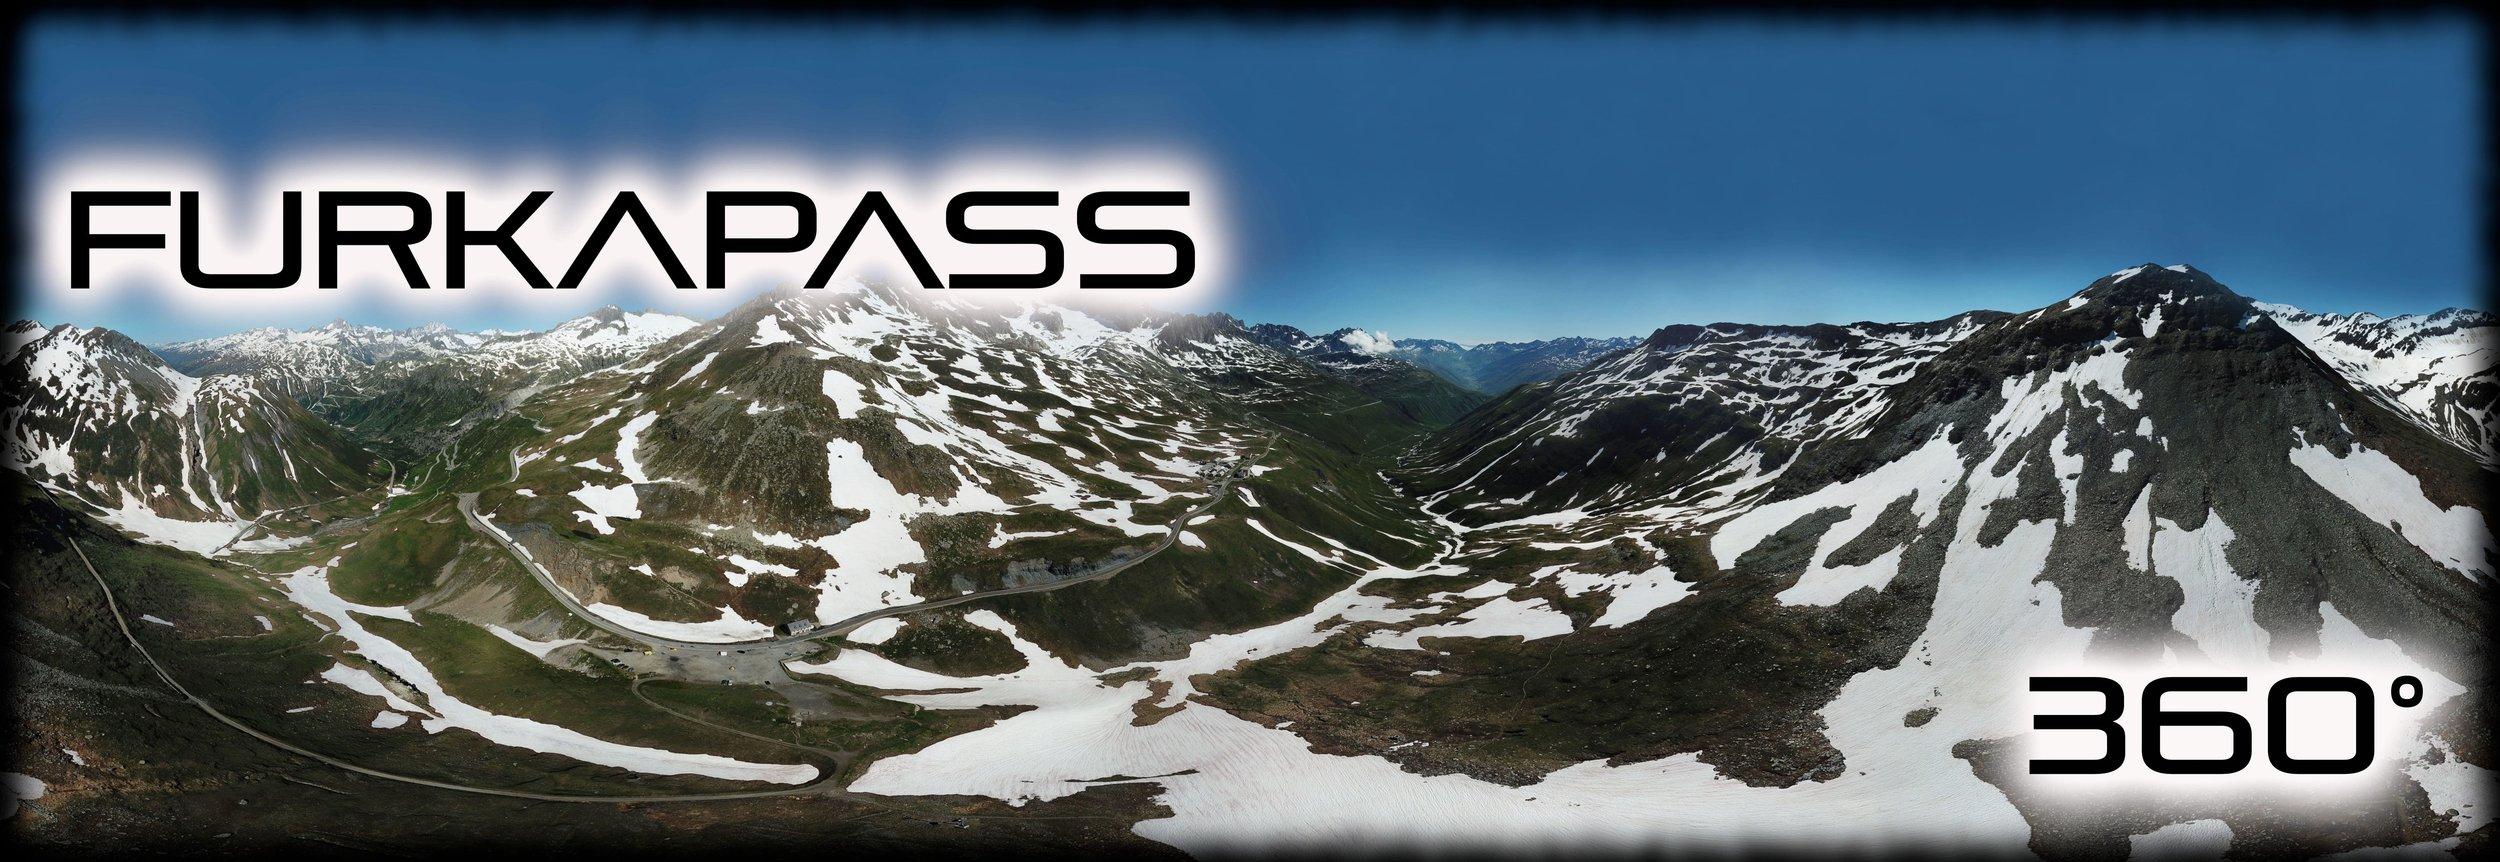 Furkapass 360° Ansicht aus der Luft